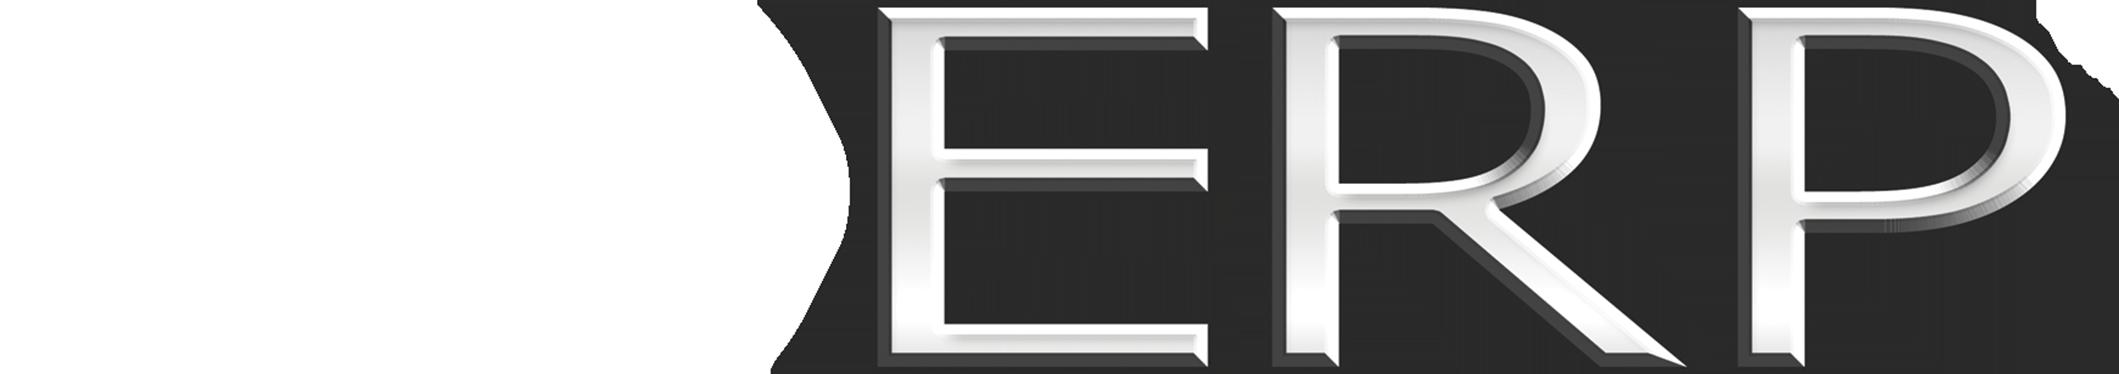 ShipERP Logo